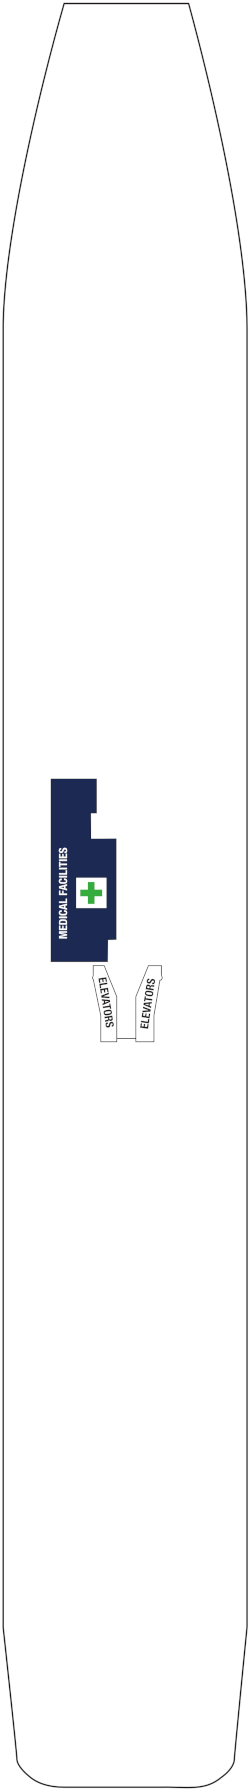 Celebrity Equinox Deck 2 Deck Plan